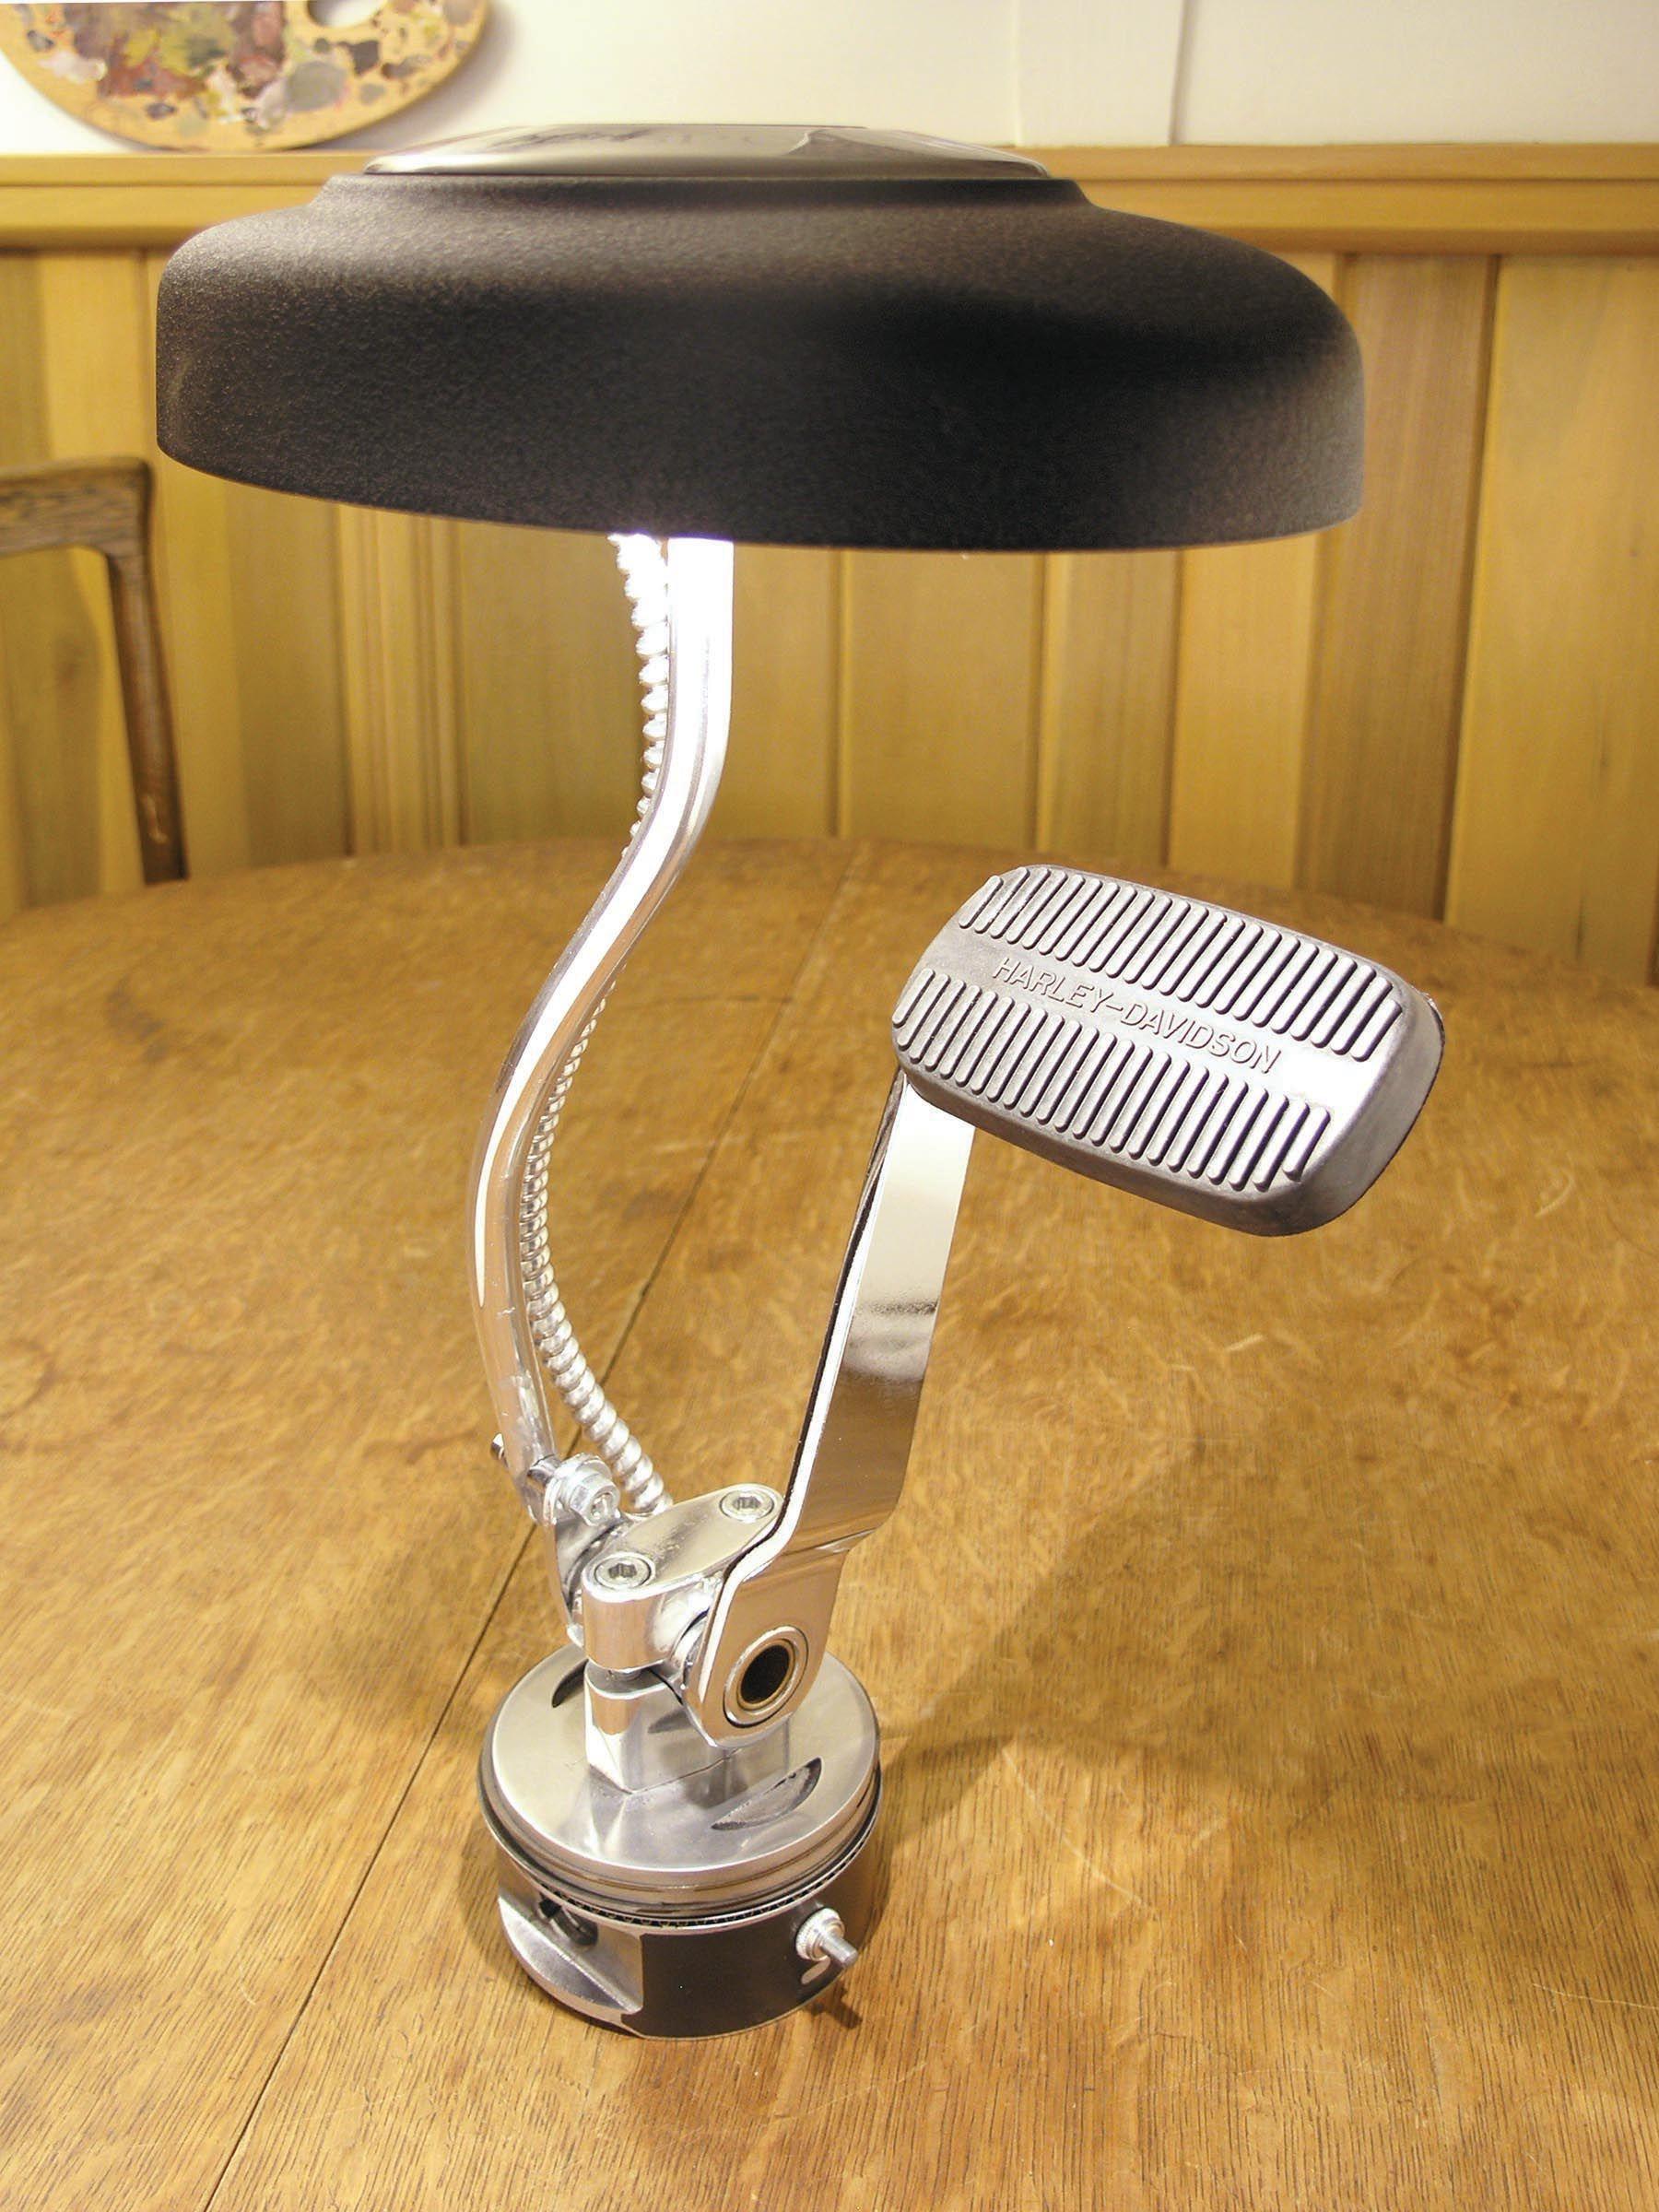 Harley davidson brake pedal lamp chromesculpture pinterest harley davidson brake pedal lamp mozeypictures Image collections